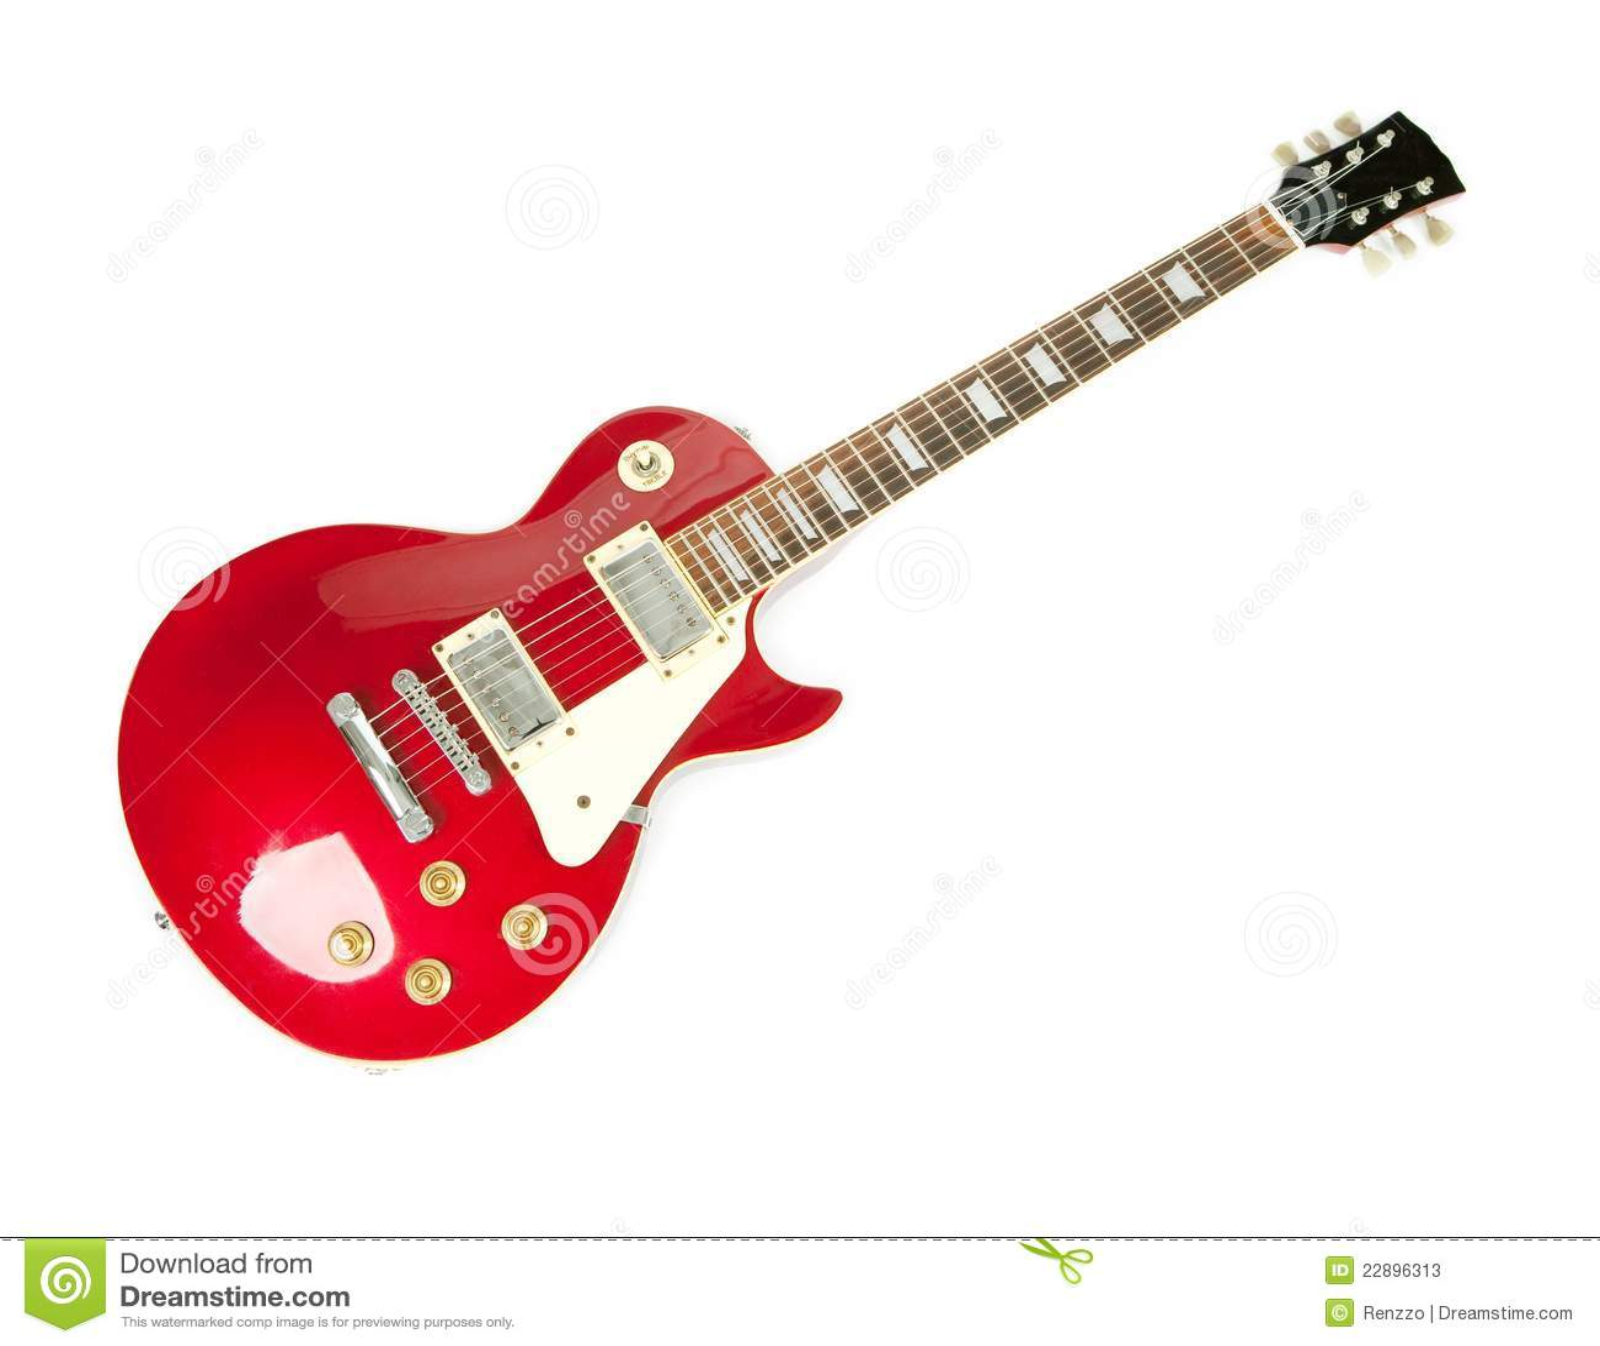 Amigurumi Guitarra Electrica : Guitarra Electrica Roja De La Carrocer?a Solida De La ...